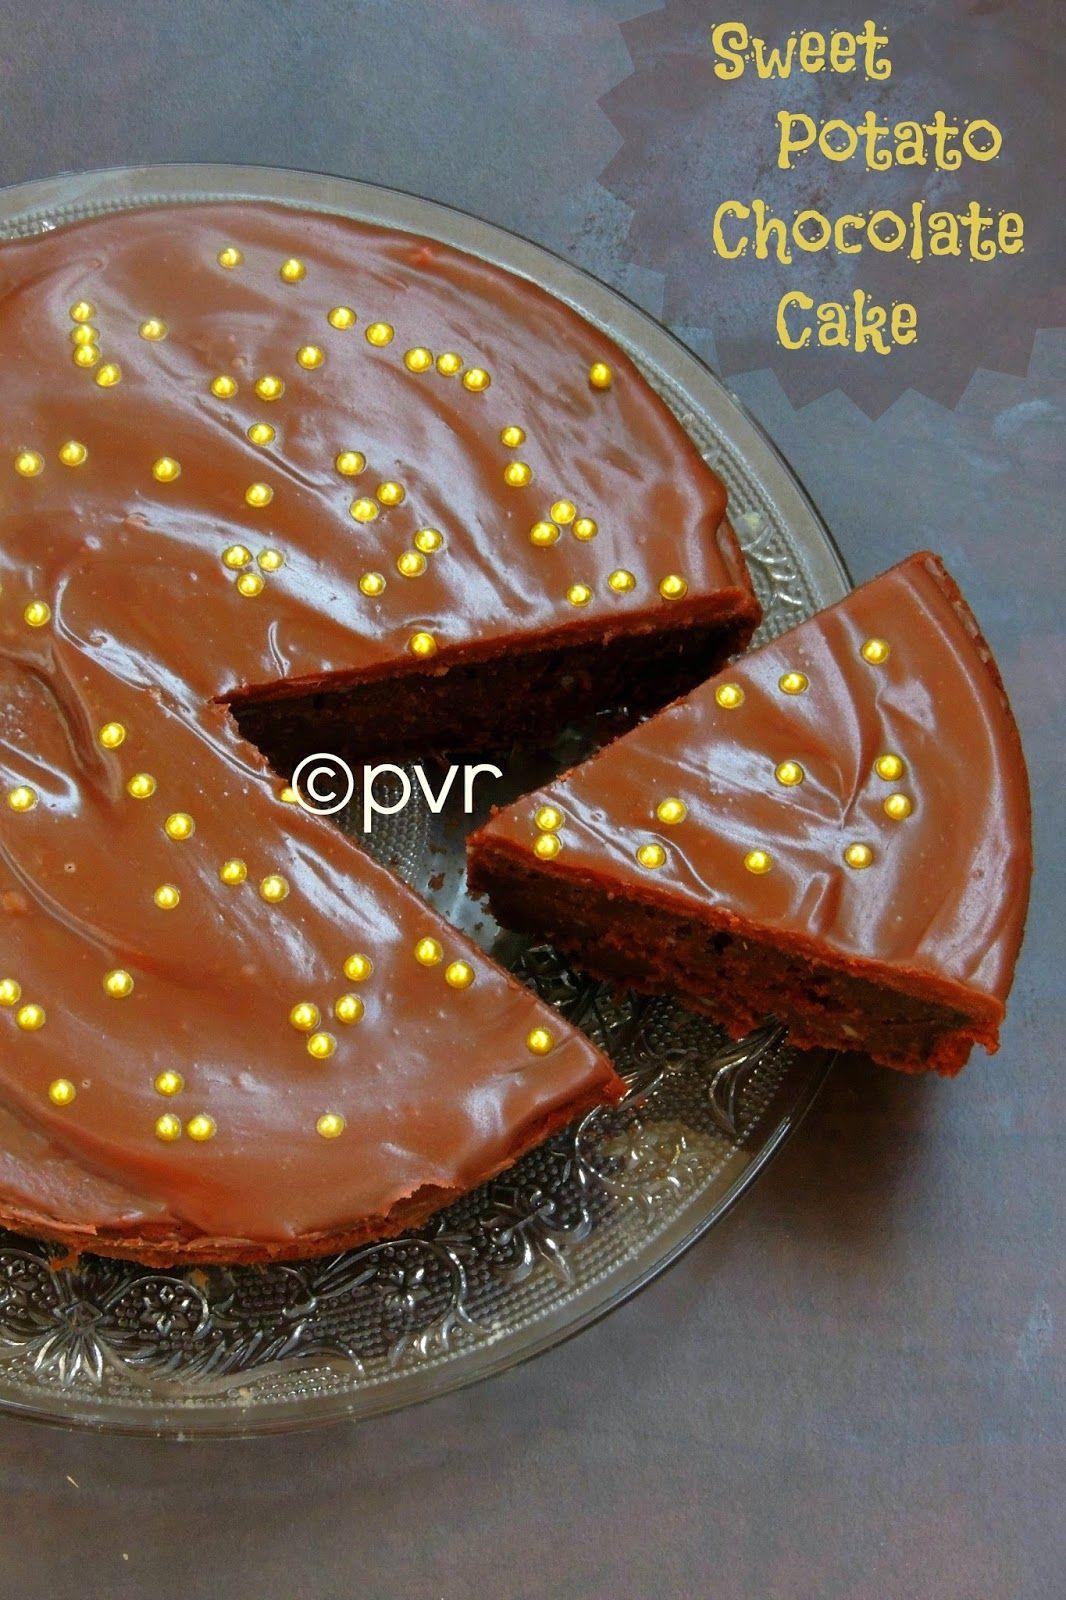 Priya S Versatile Recipes Eggless Sweet Potato Chocolate